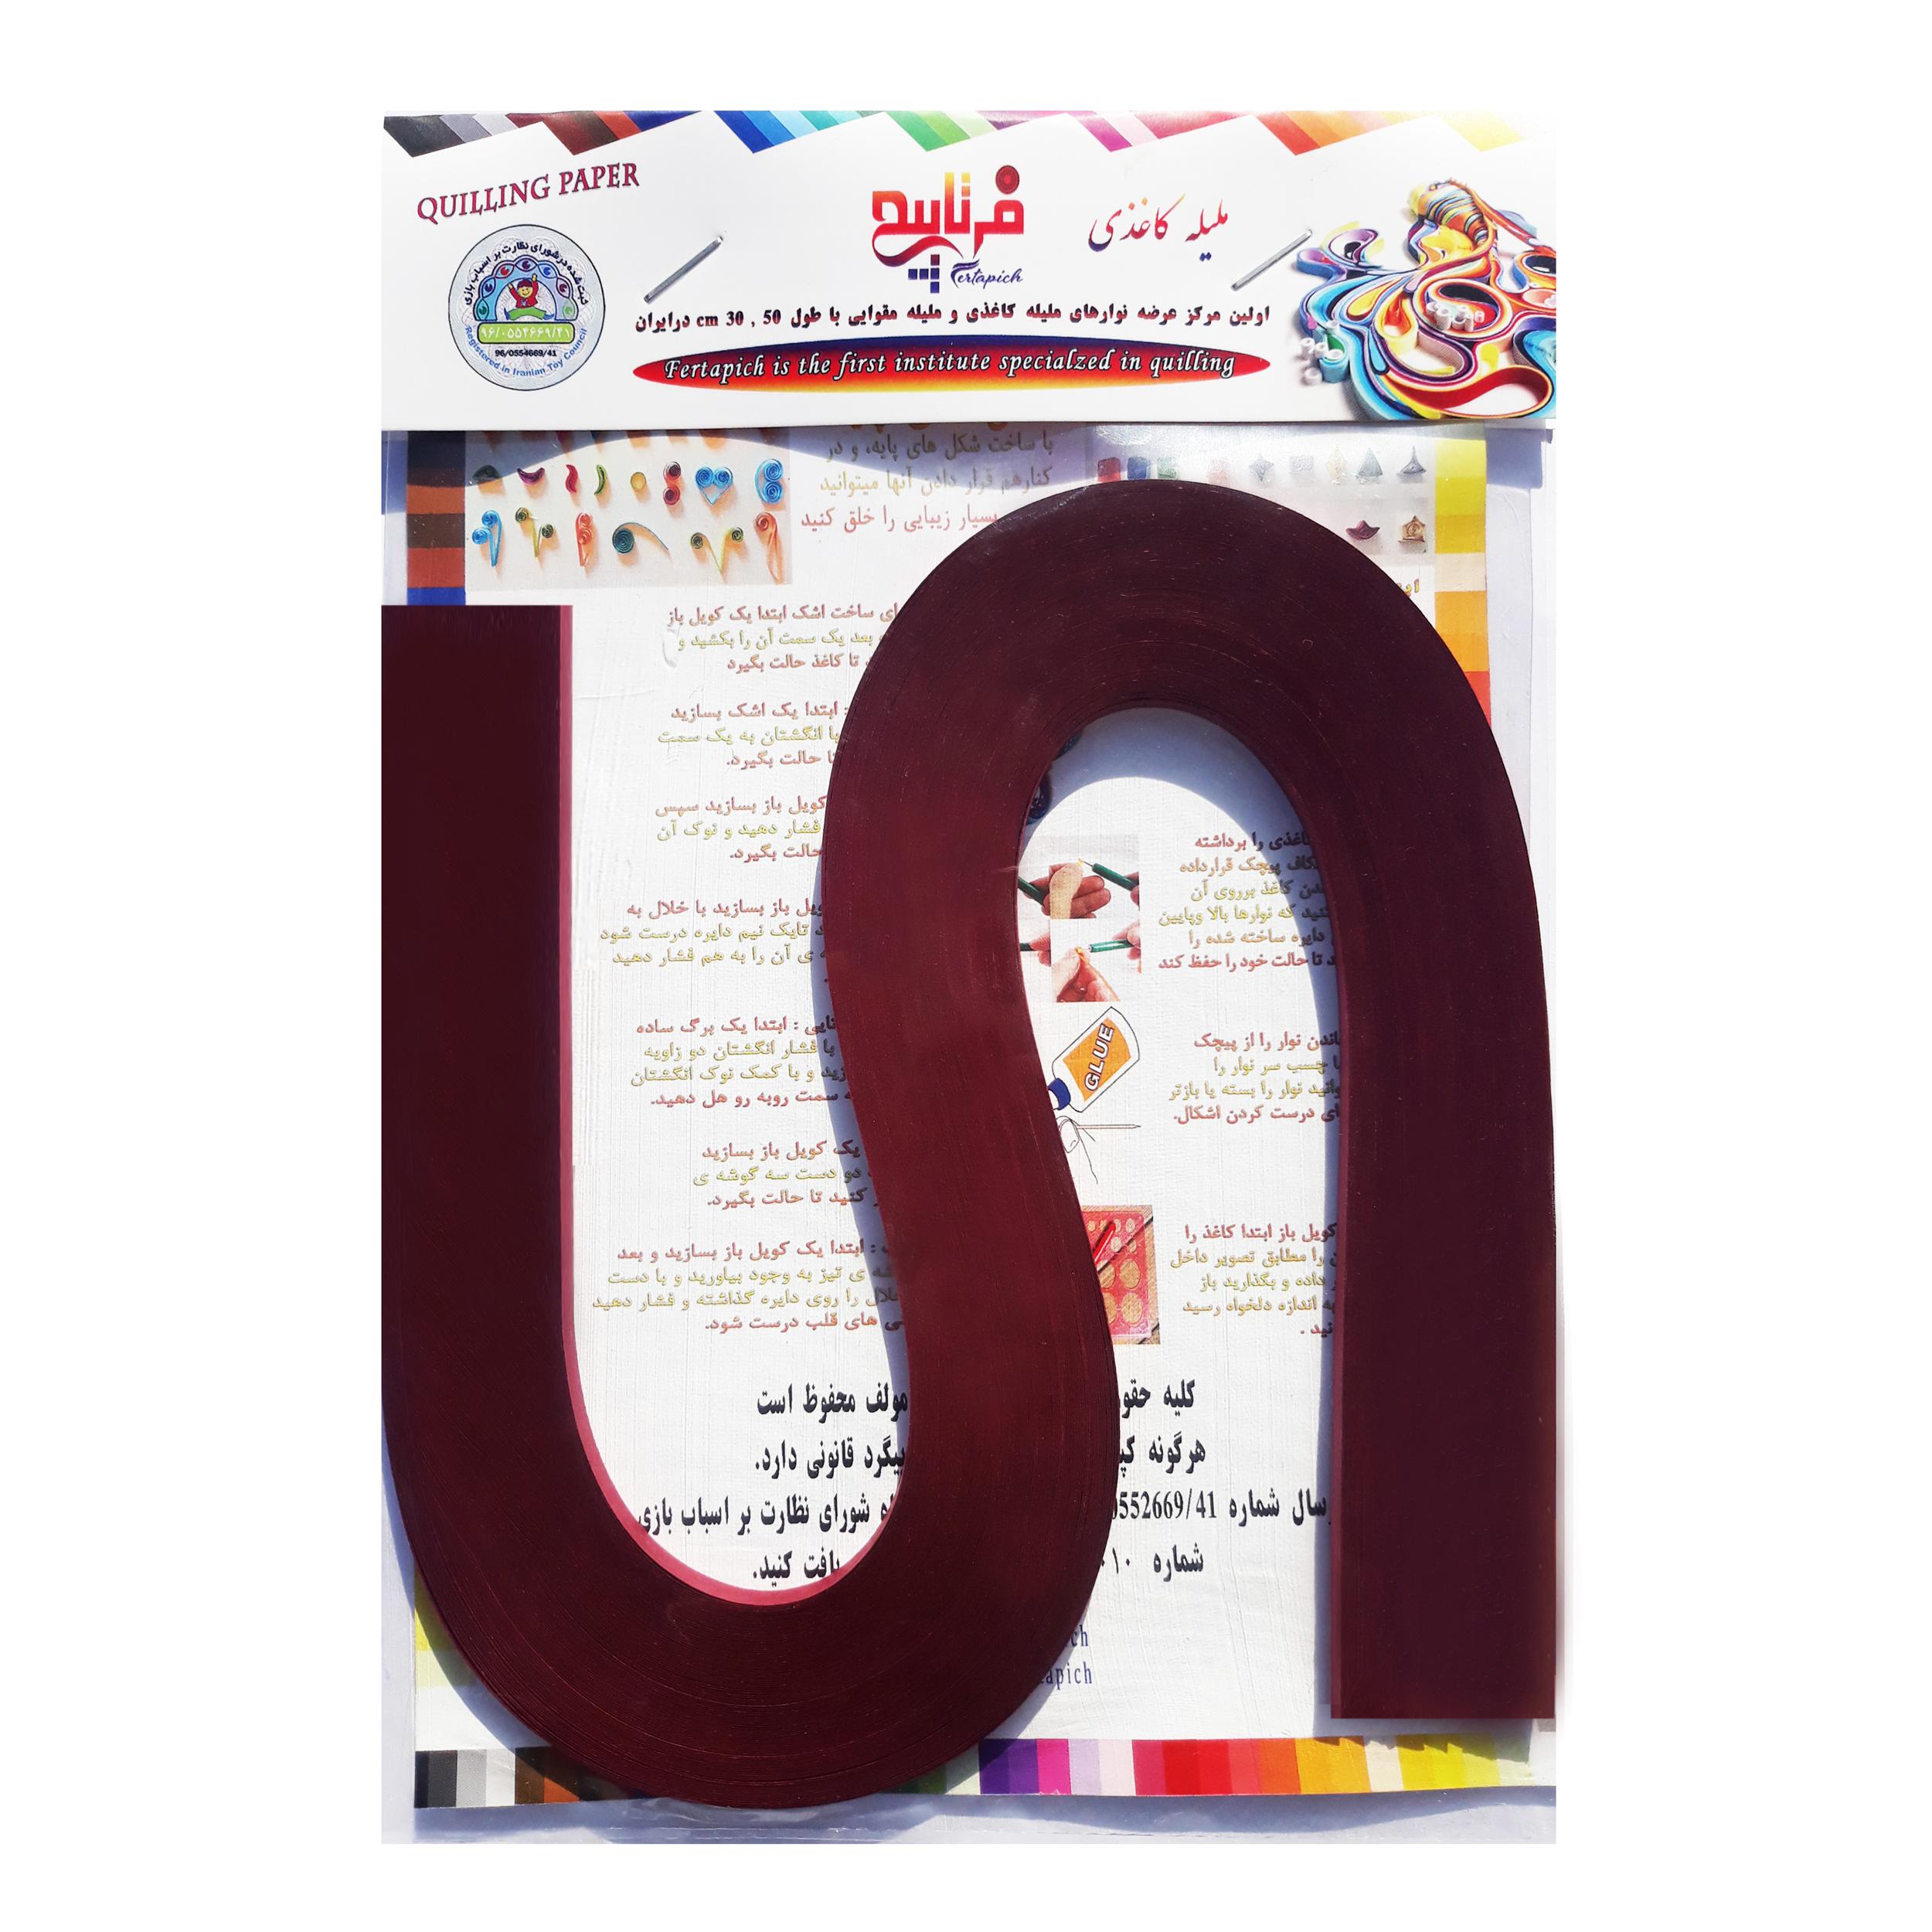 نوار ملیله کاغذی فرتاپیچ کد 35.5 بسته 100 عددی